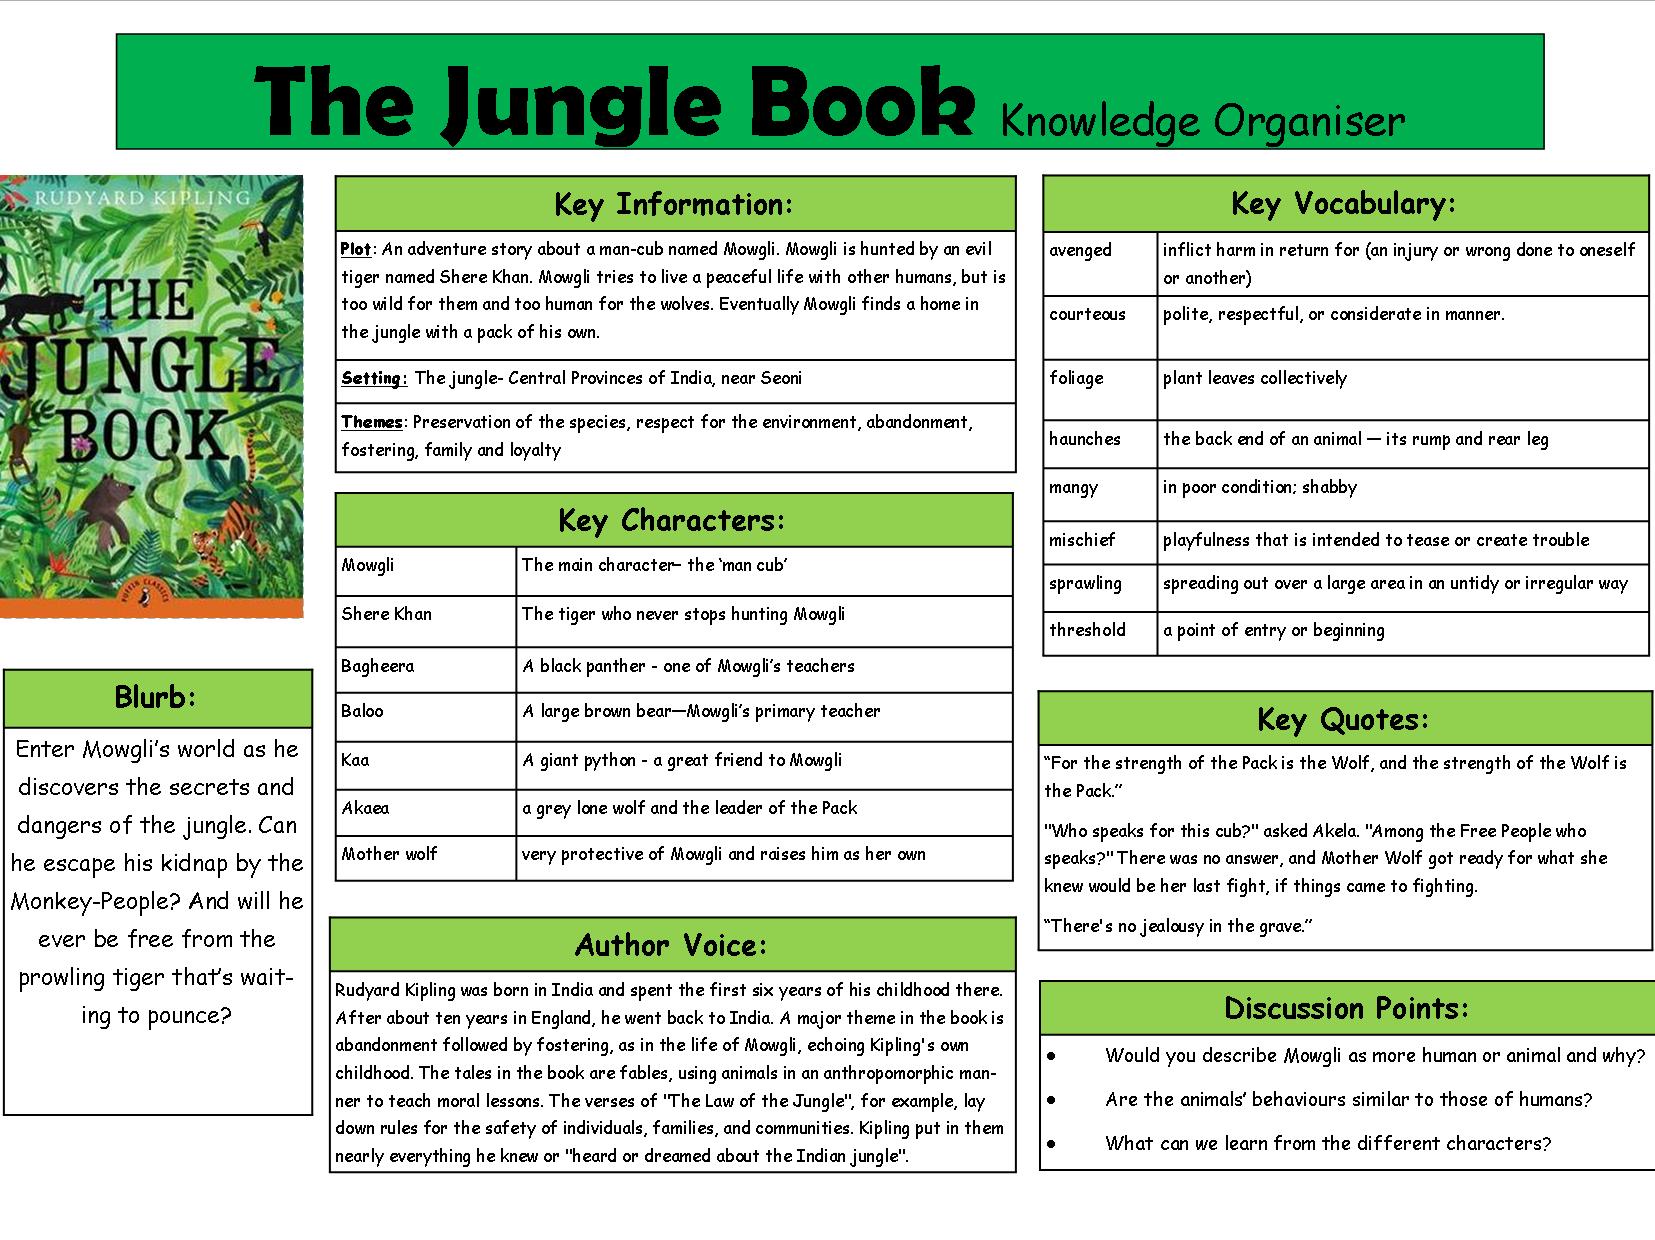 The Jungle Book Knowledge Organiser